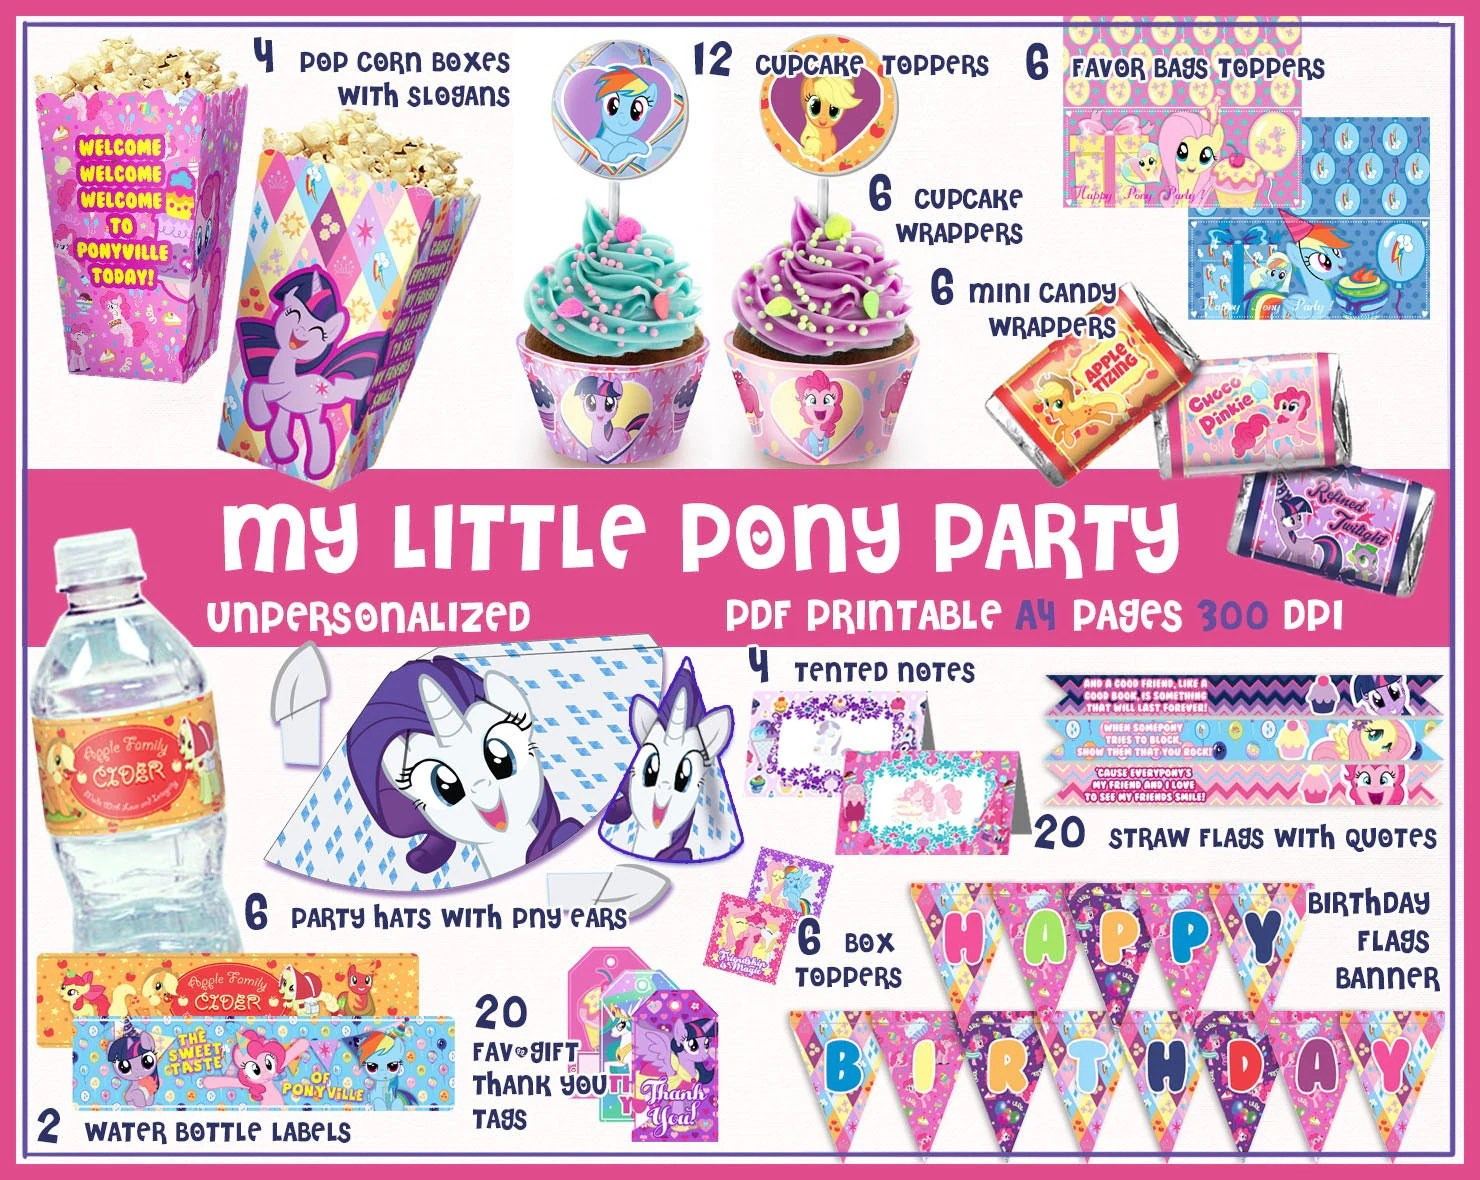 My Little Pony Birthday Pony Party Printables Decorations